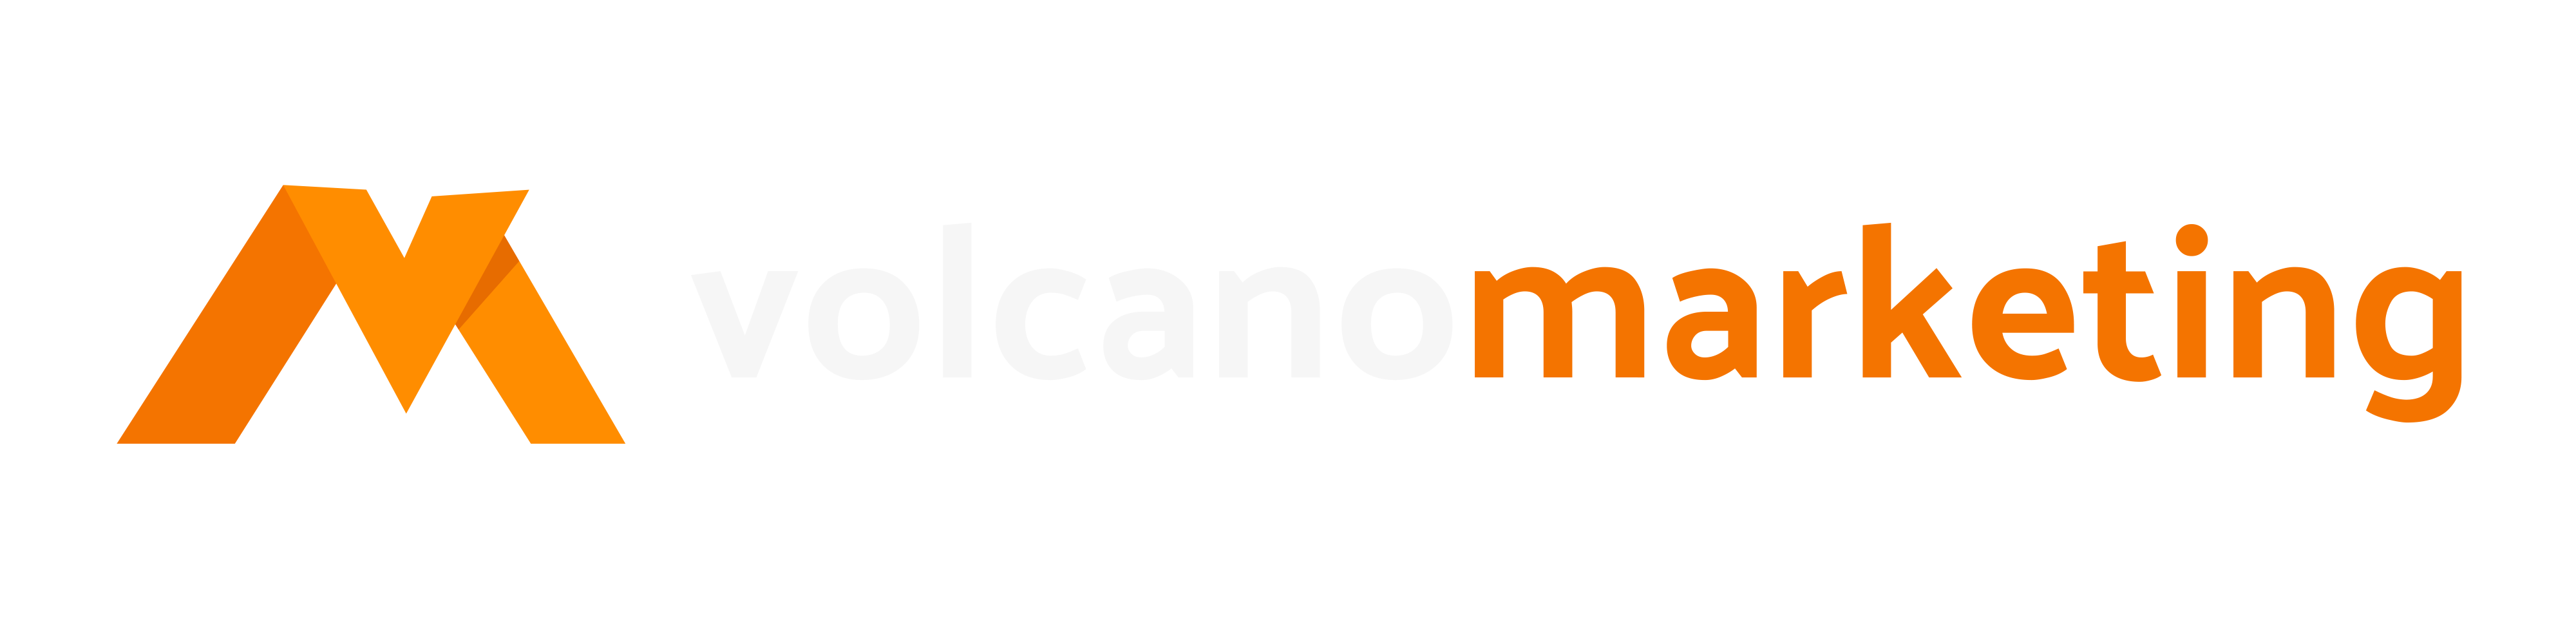 Volcano marketing logo